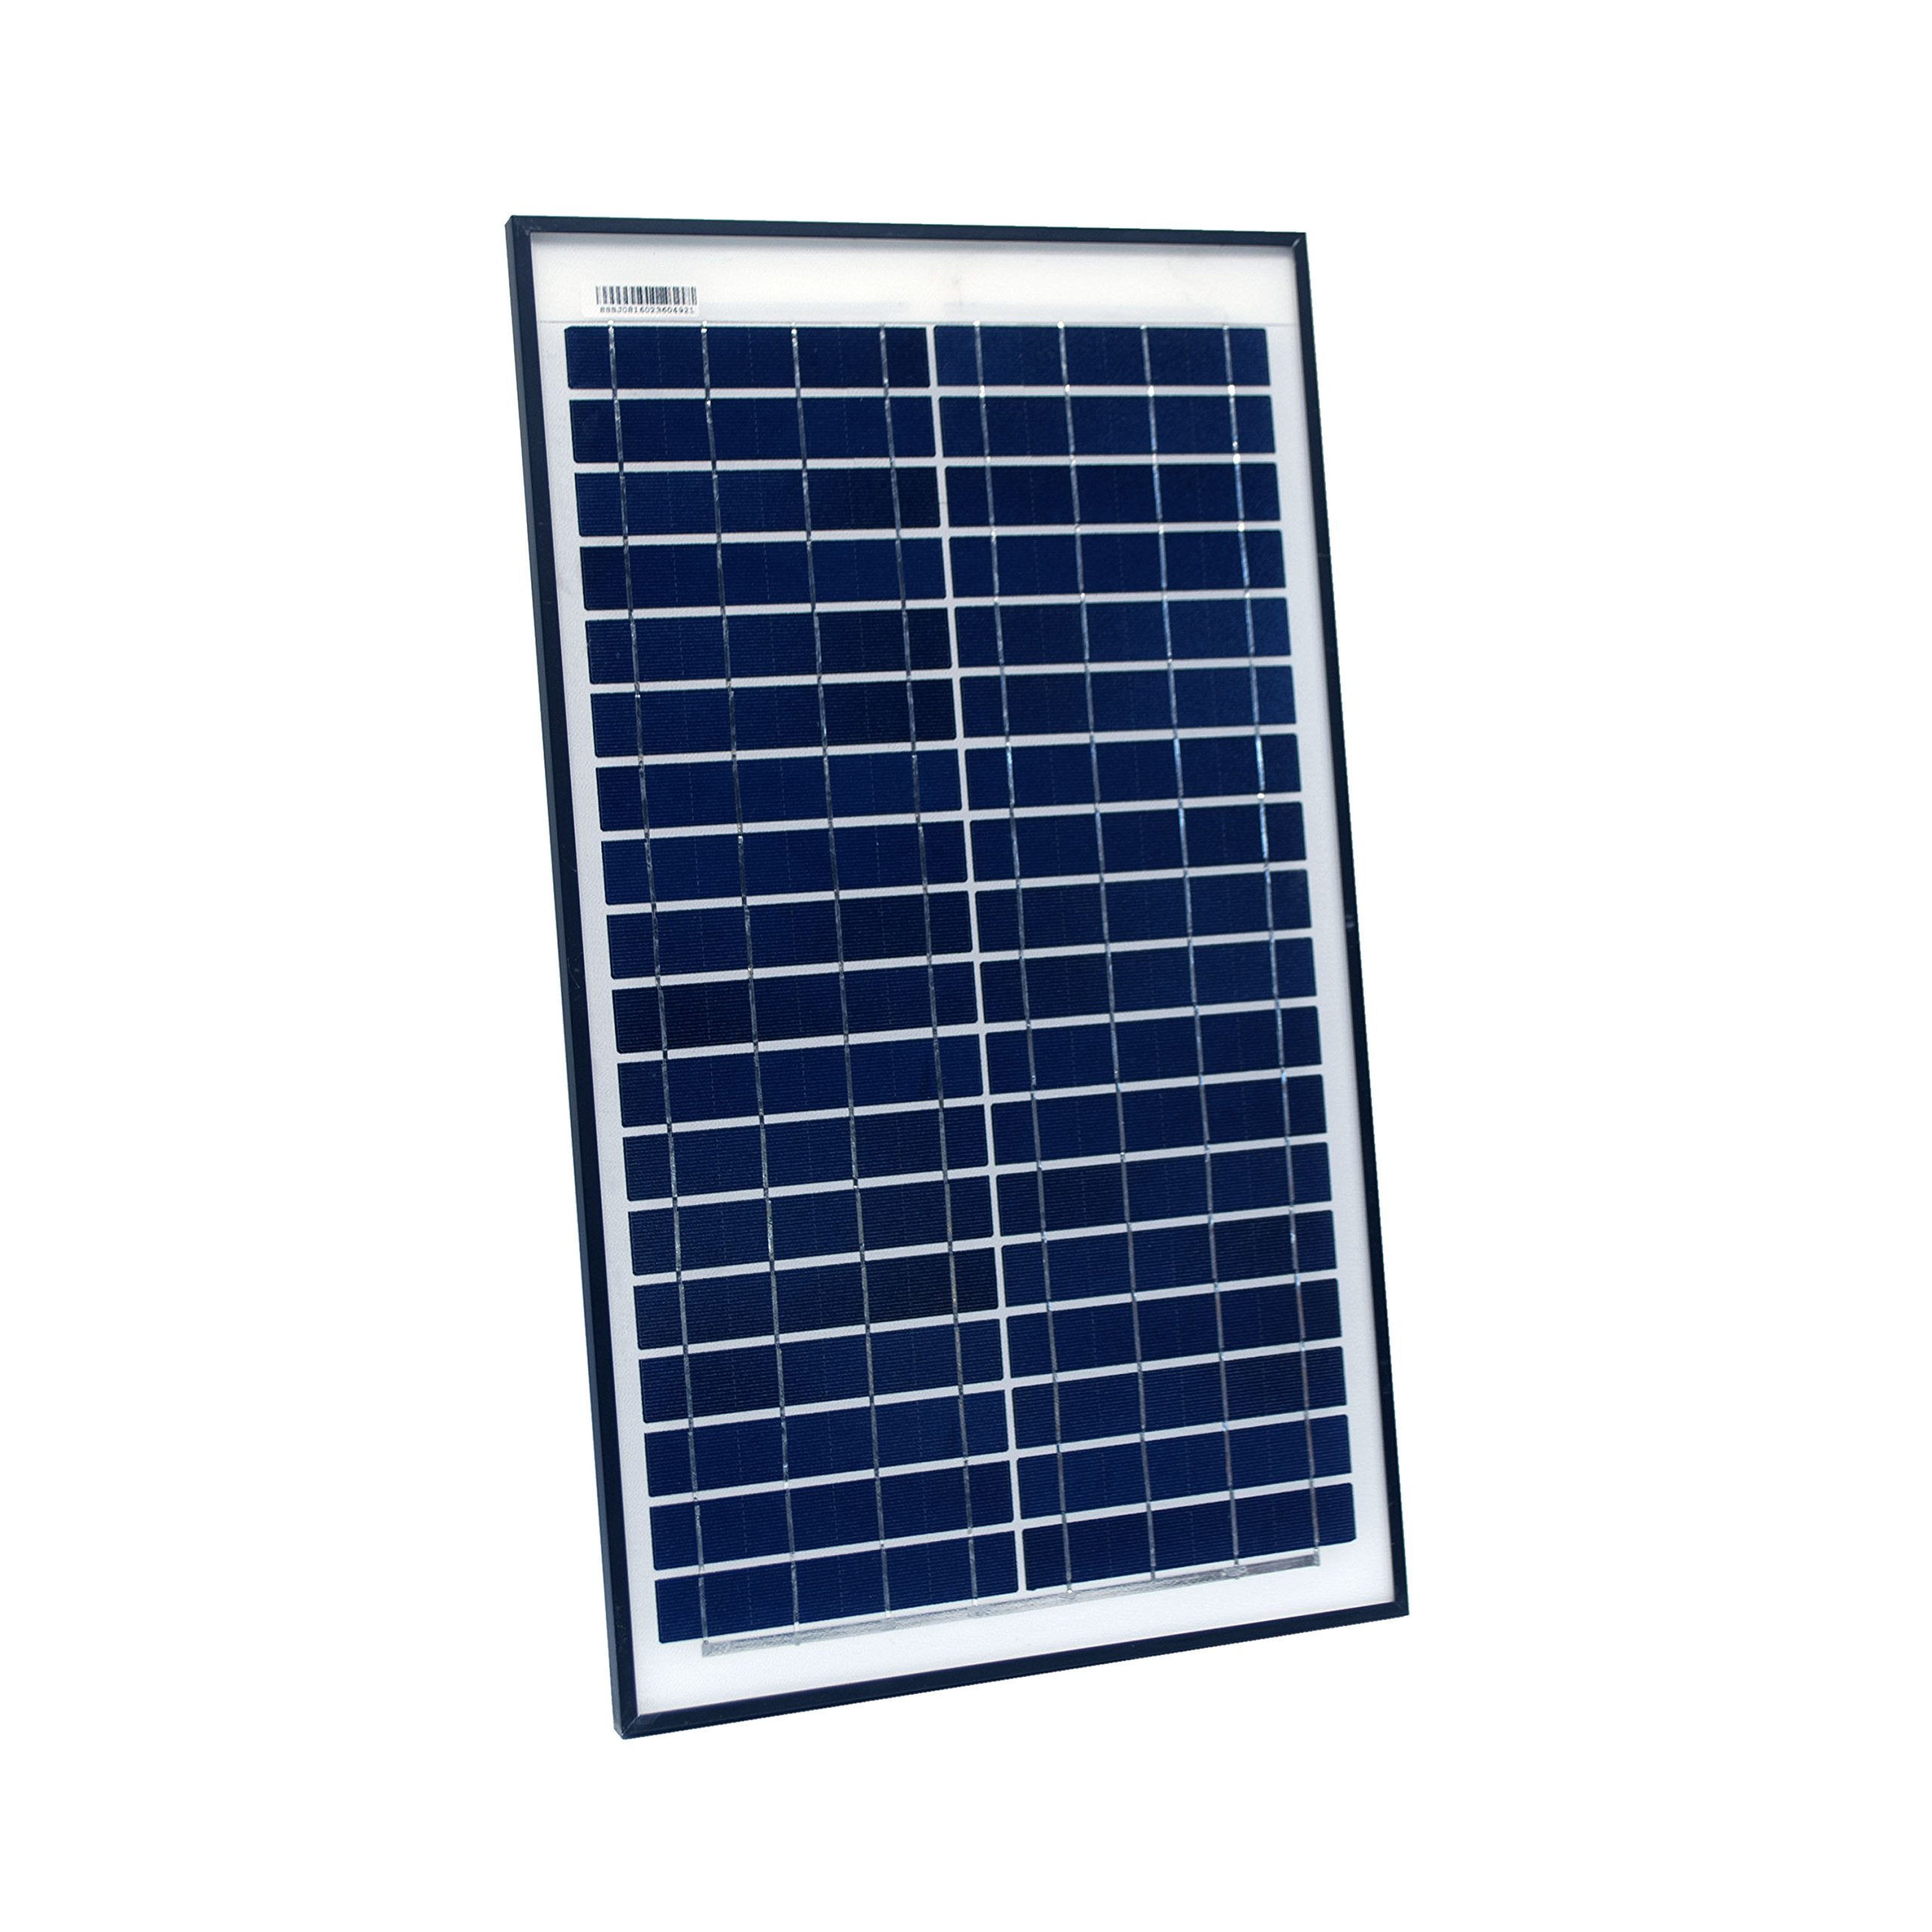 ALEKO PP25W12V 25 Watt 12 Volt Polycrystalline Solar Panel for Gate Opener Pool Garden Driveway